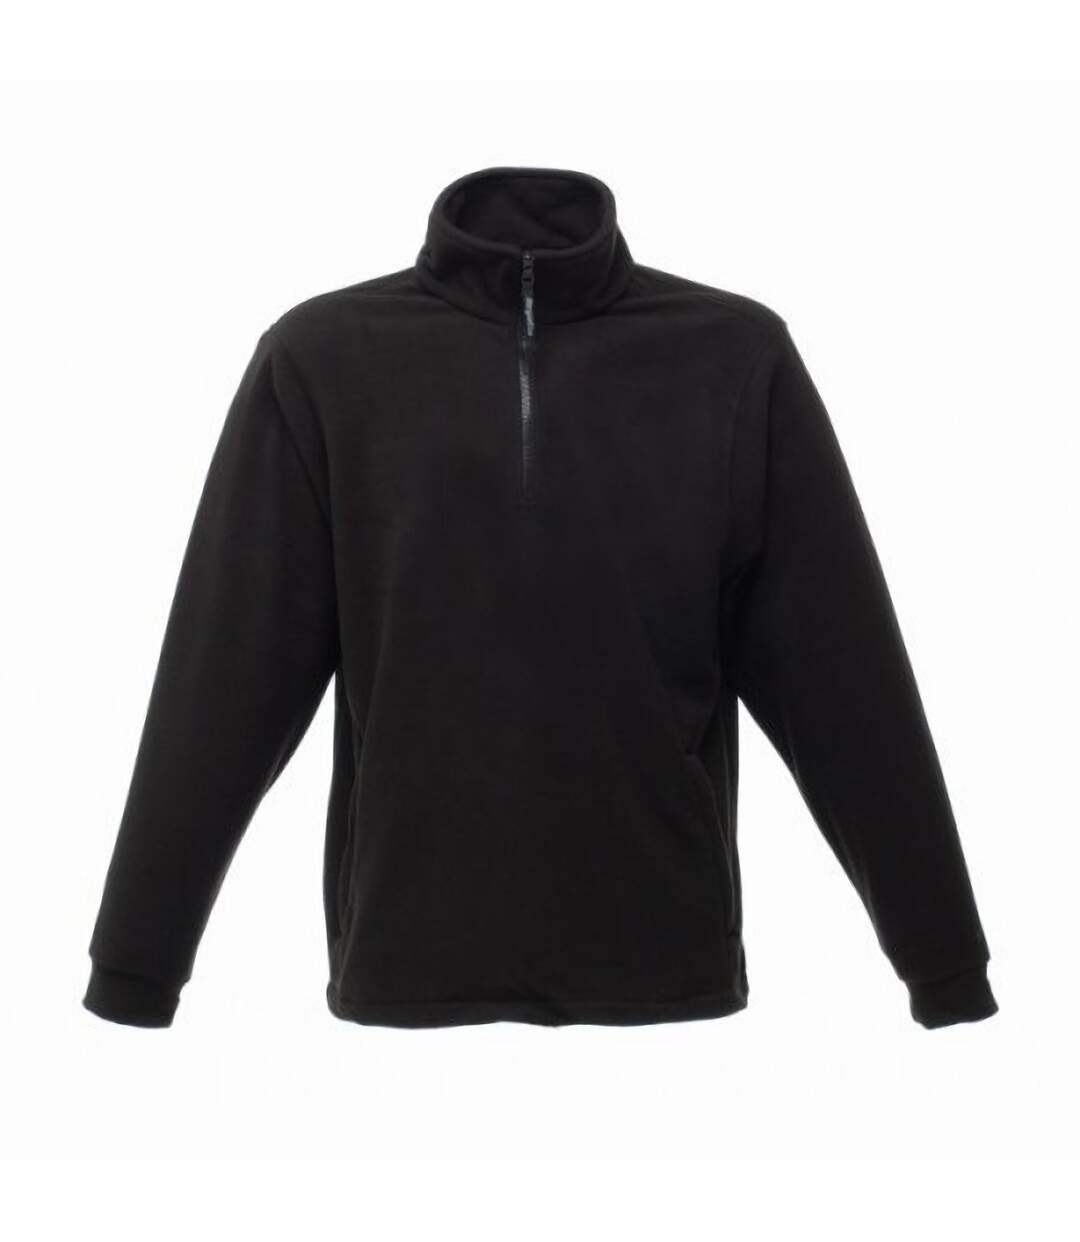 Regatta Thor Overhead Half Zip Anti-Pill Fleece Top (170 GSM) (Black) - UTBC810